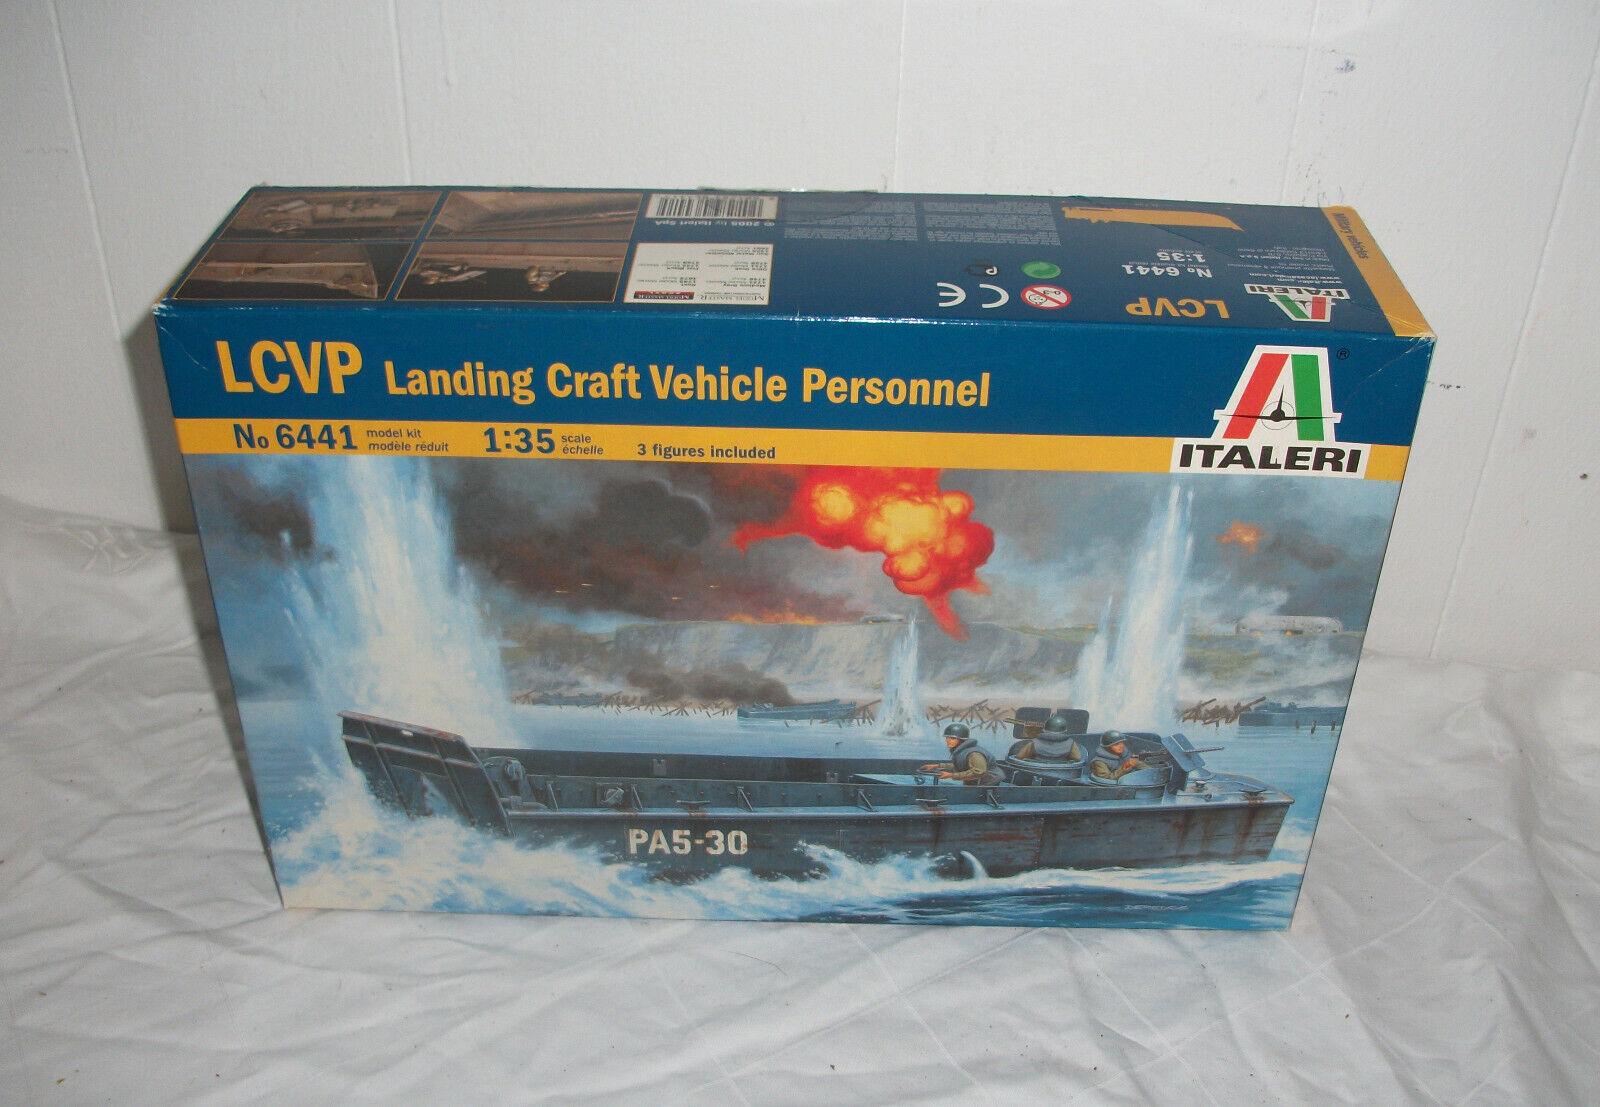 Italeri LandungsStiefel LCVP  6441. Bausatz 1  35.